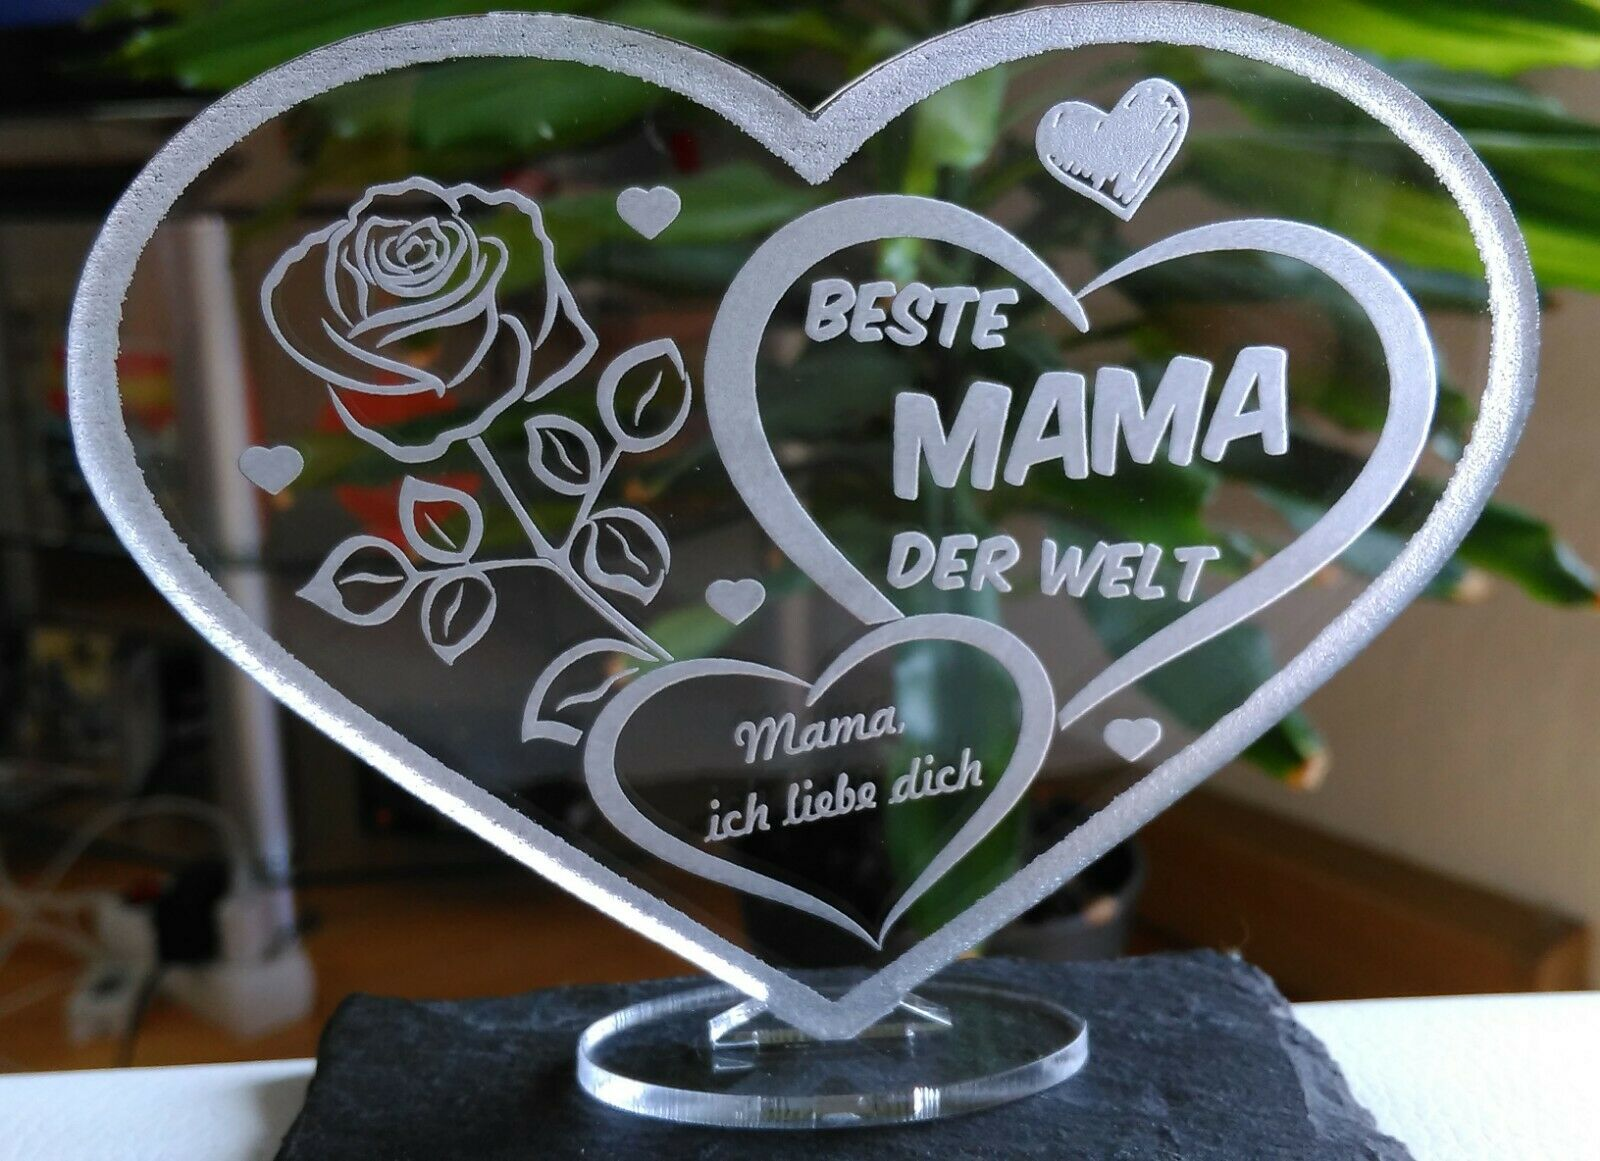 HERZ MUTTERTAG GESCHENK BESTE MAMA ALLES GUTE-ALLES LIEBE GEBURTSTAG GESCHENK